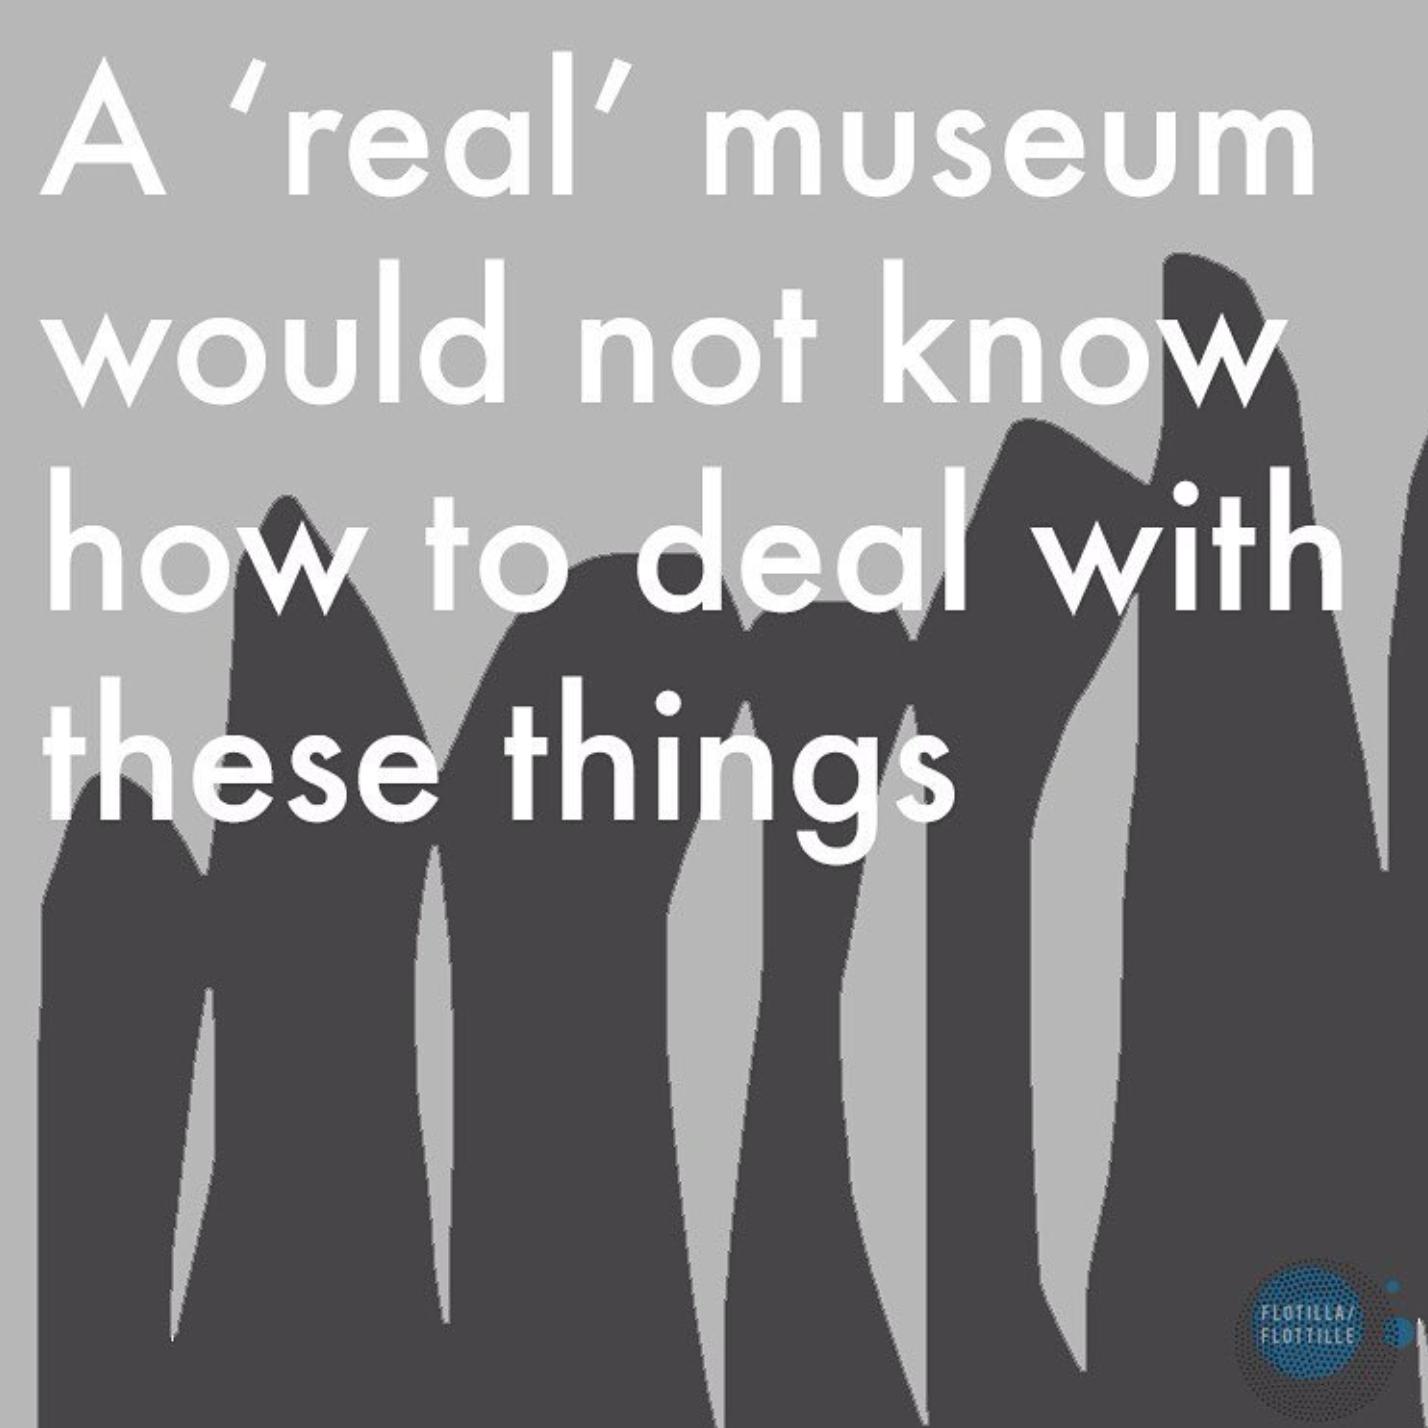 2017-09-21 (7) living art museum.png